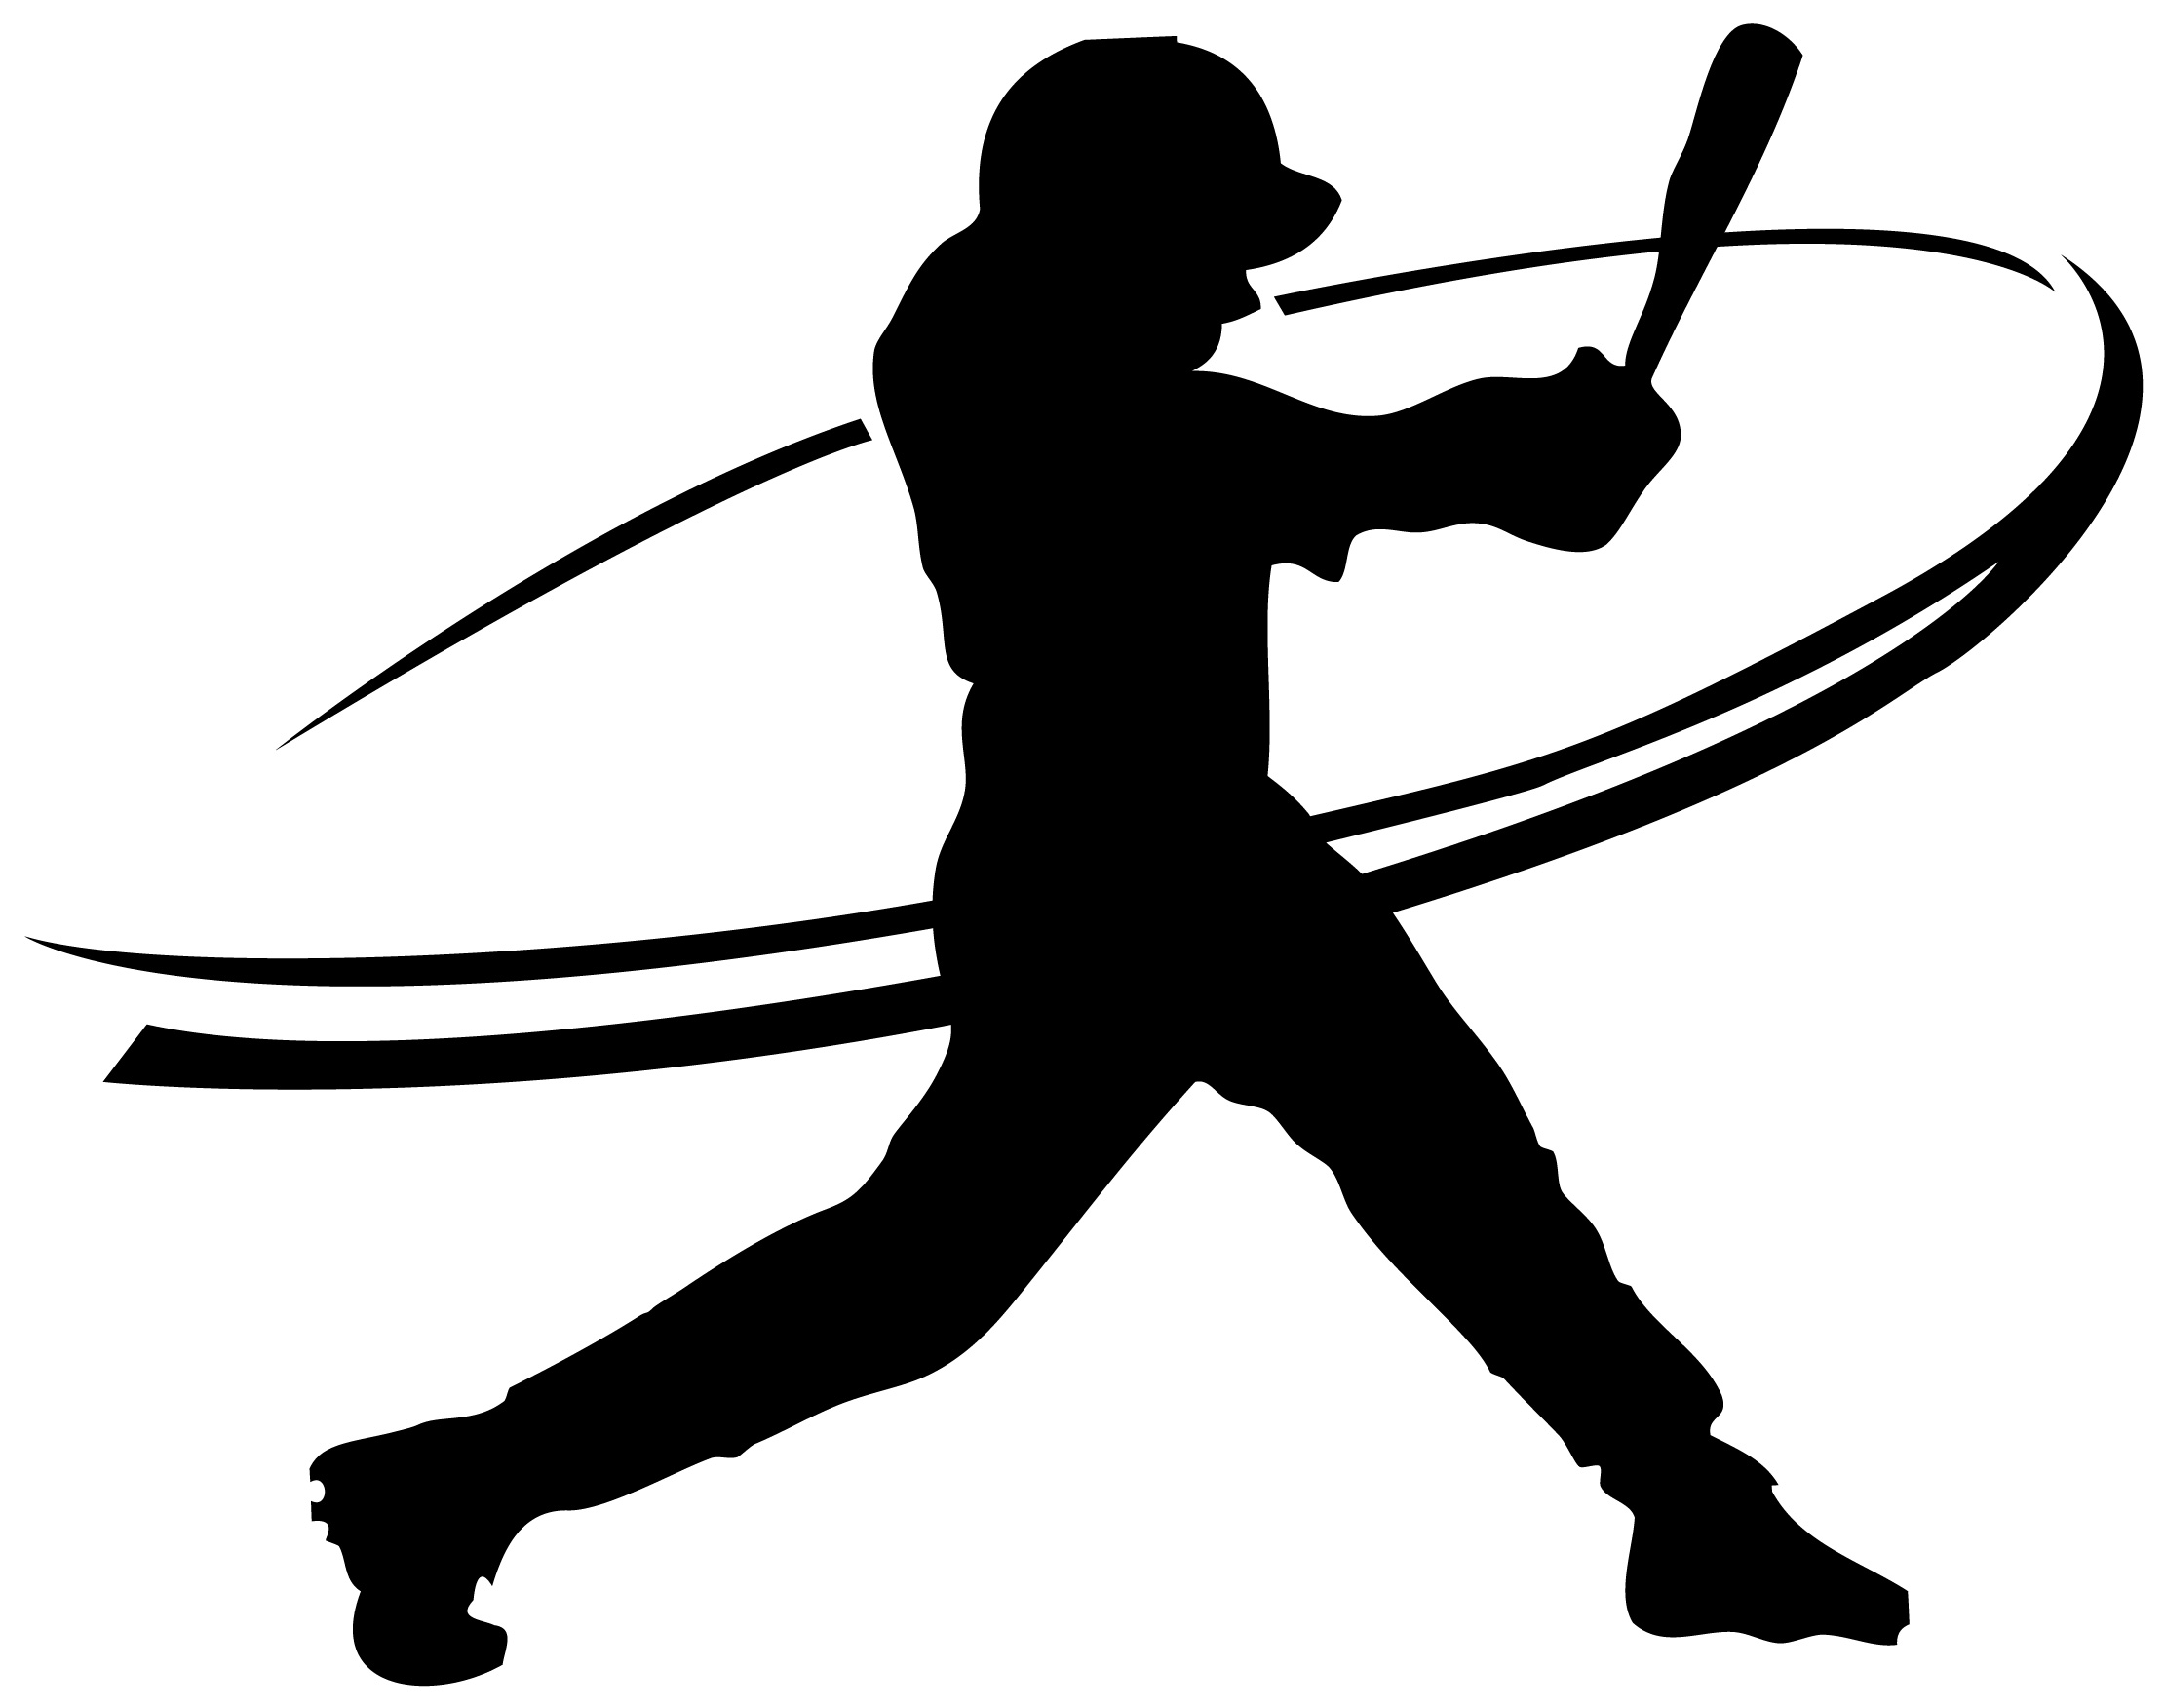 baseball batter clipart free - Clipground Little Boy Playing Baseball